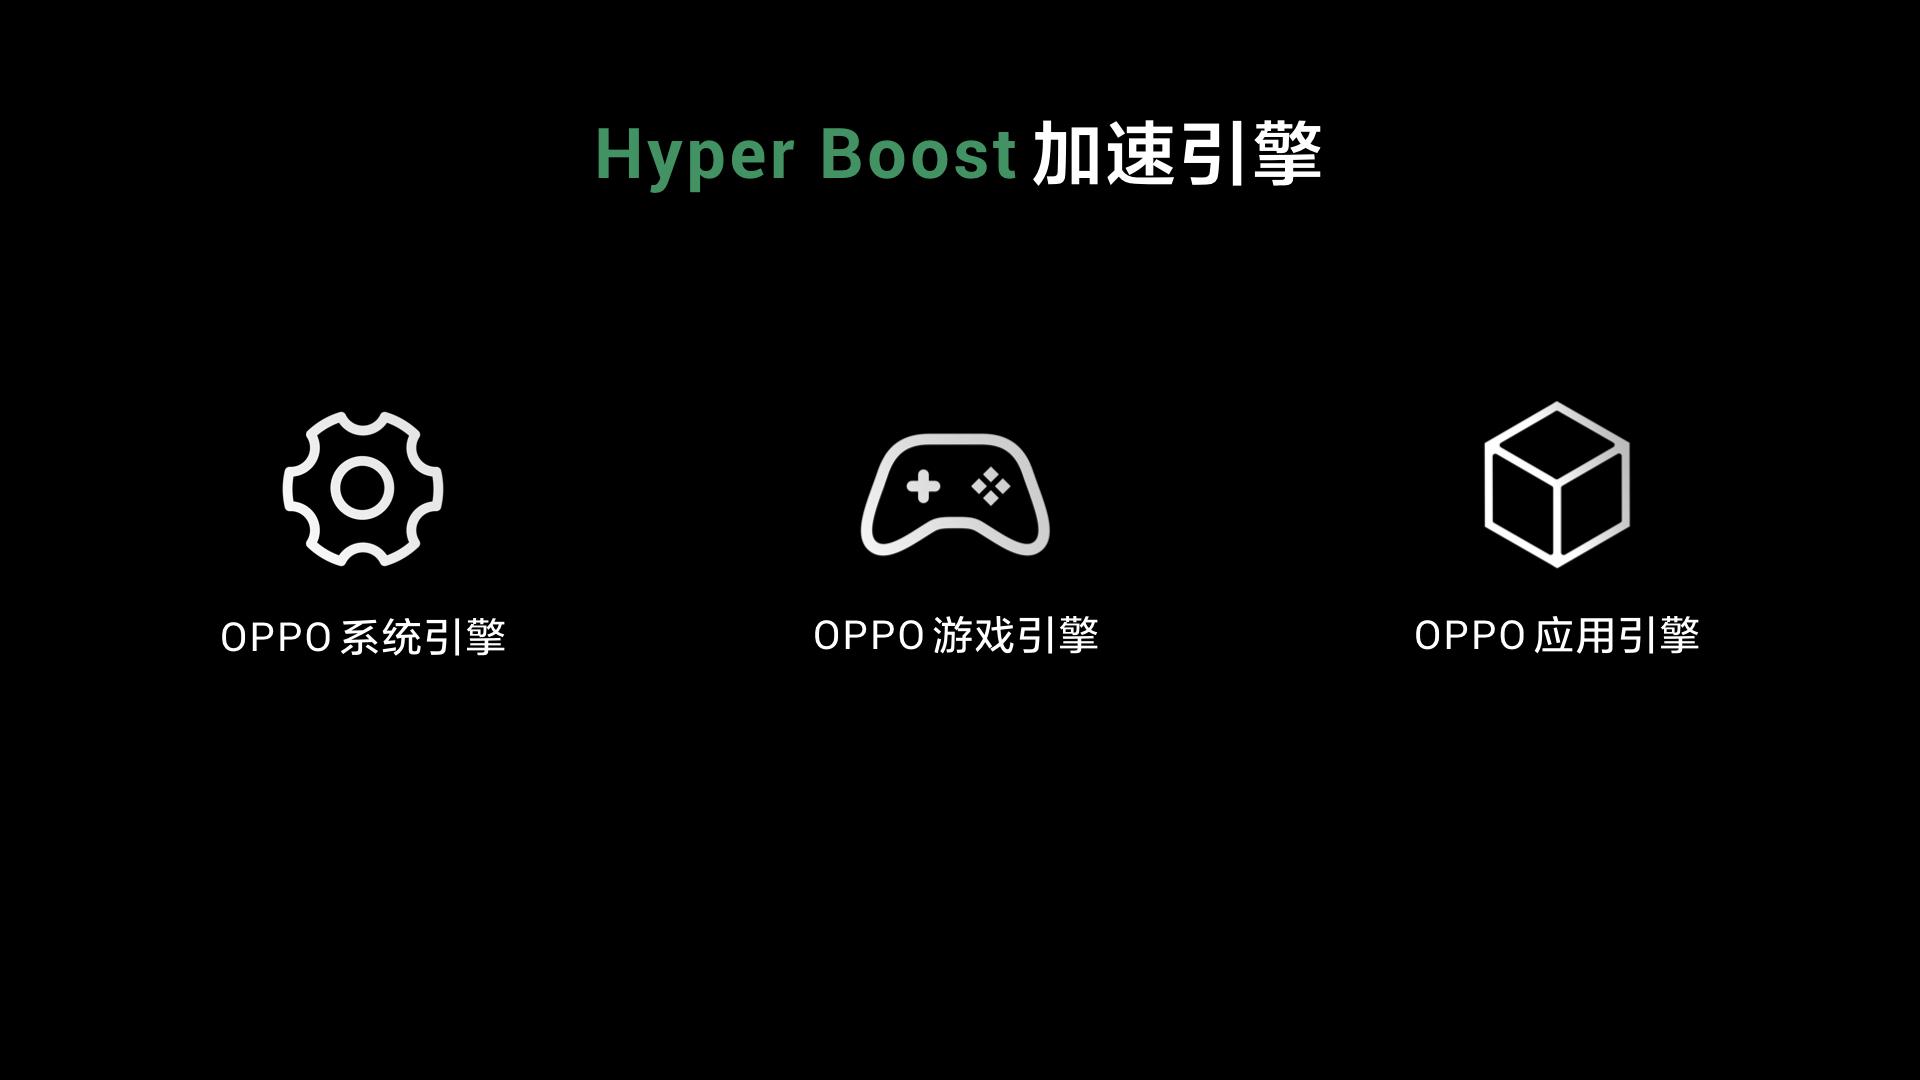 Hyper Boost加速引擎.jpeg